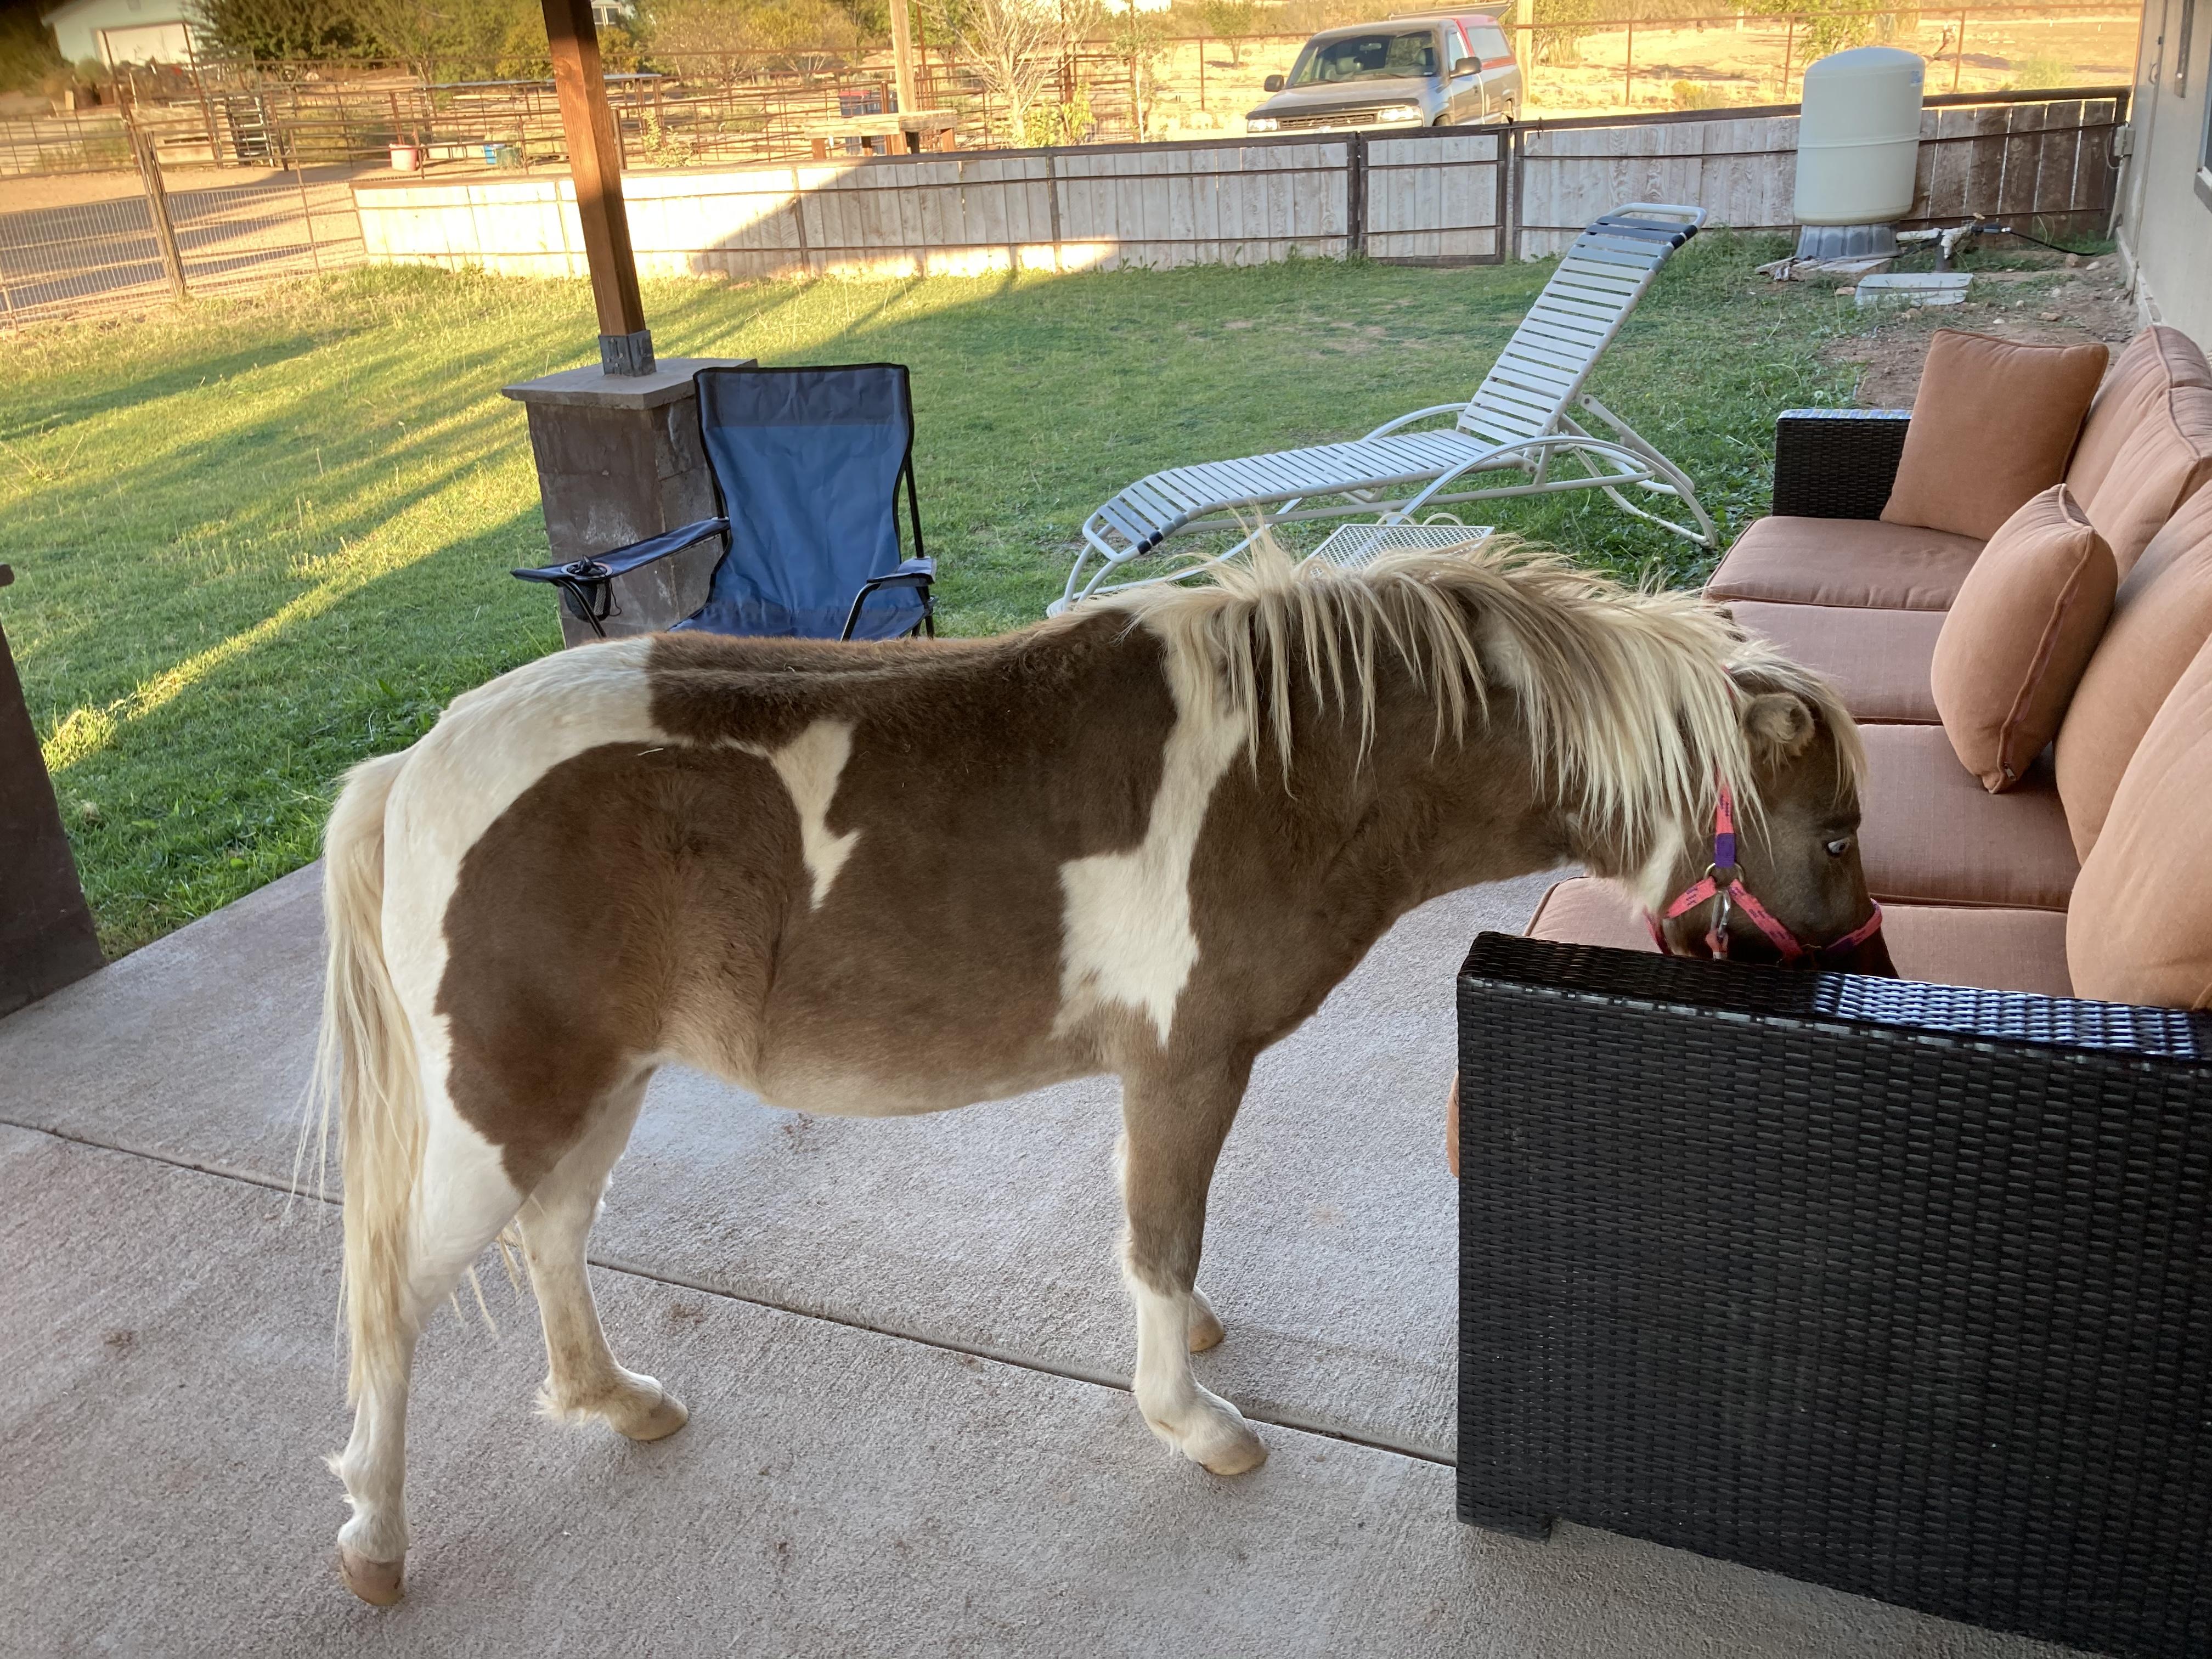 Eco horse ranch and spiritual oasis